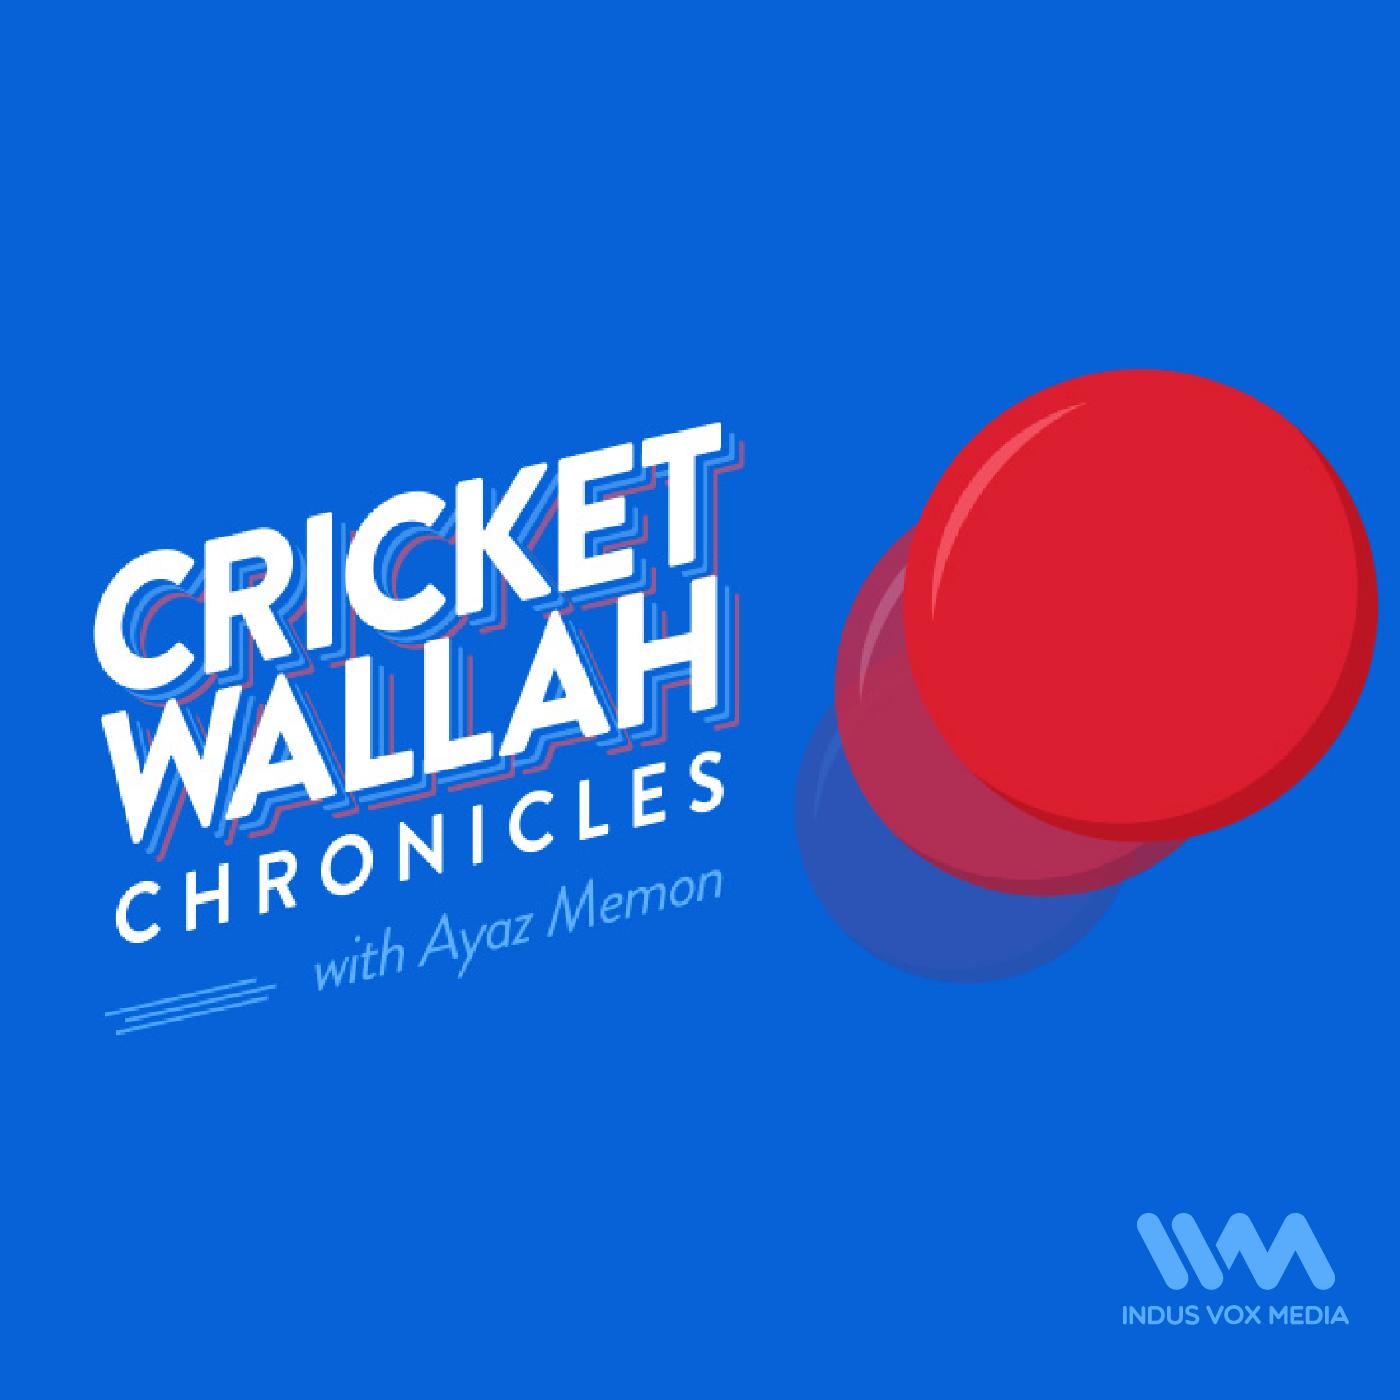 Cricketwallah Chronicles |